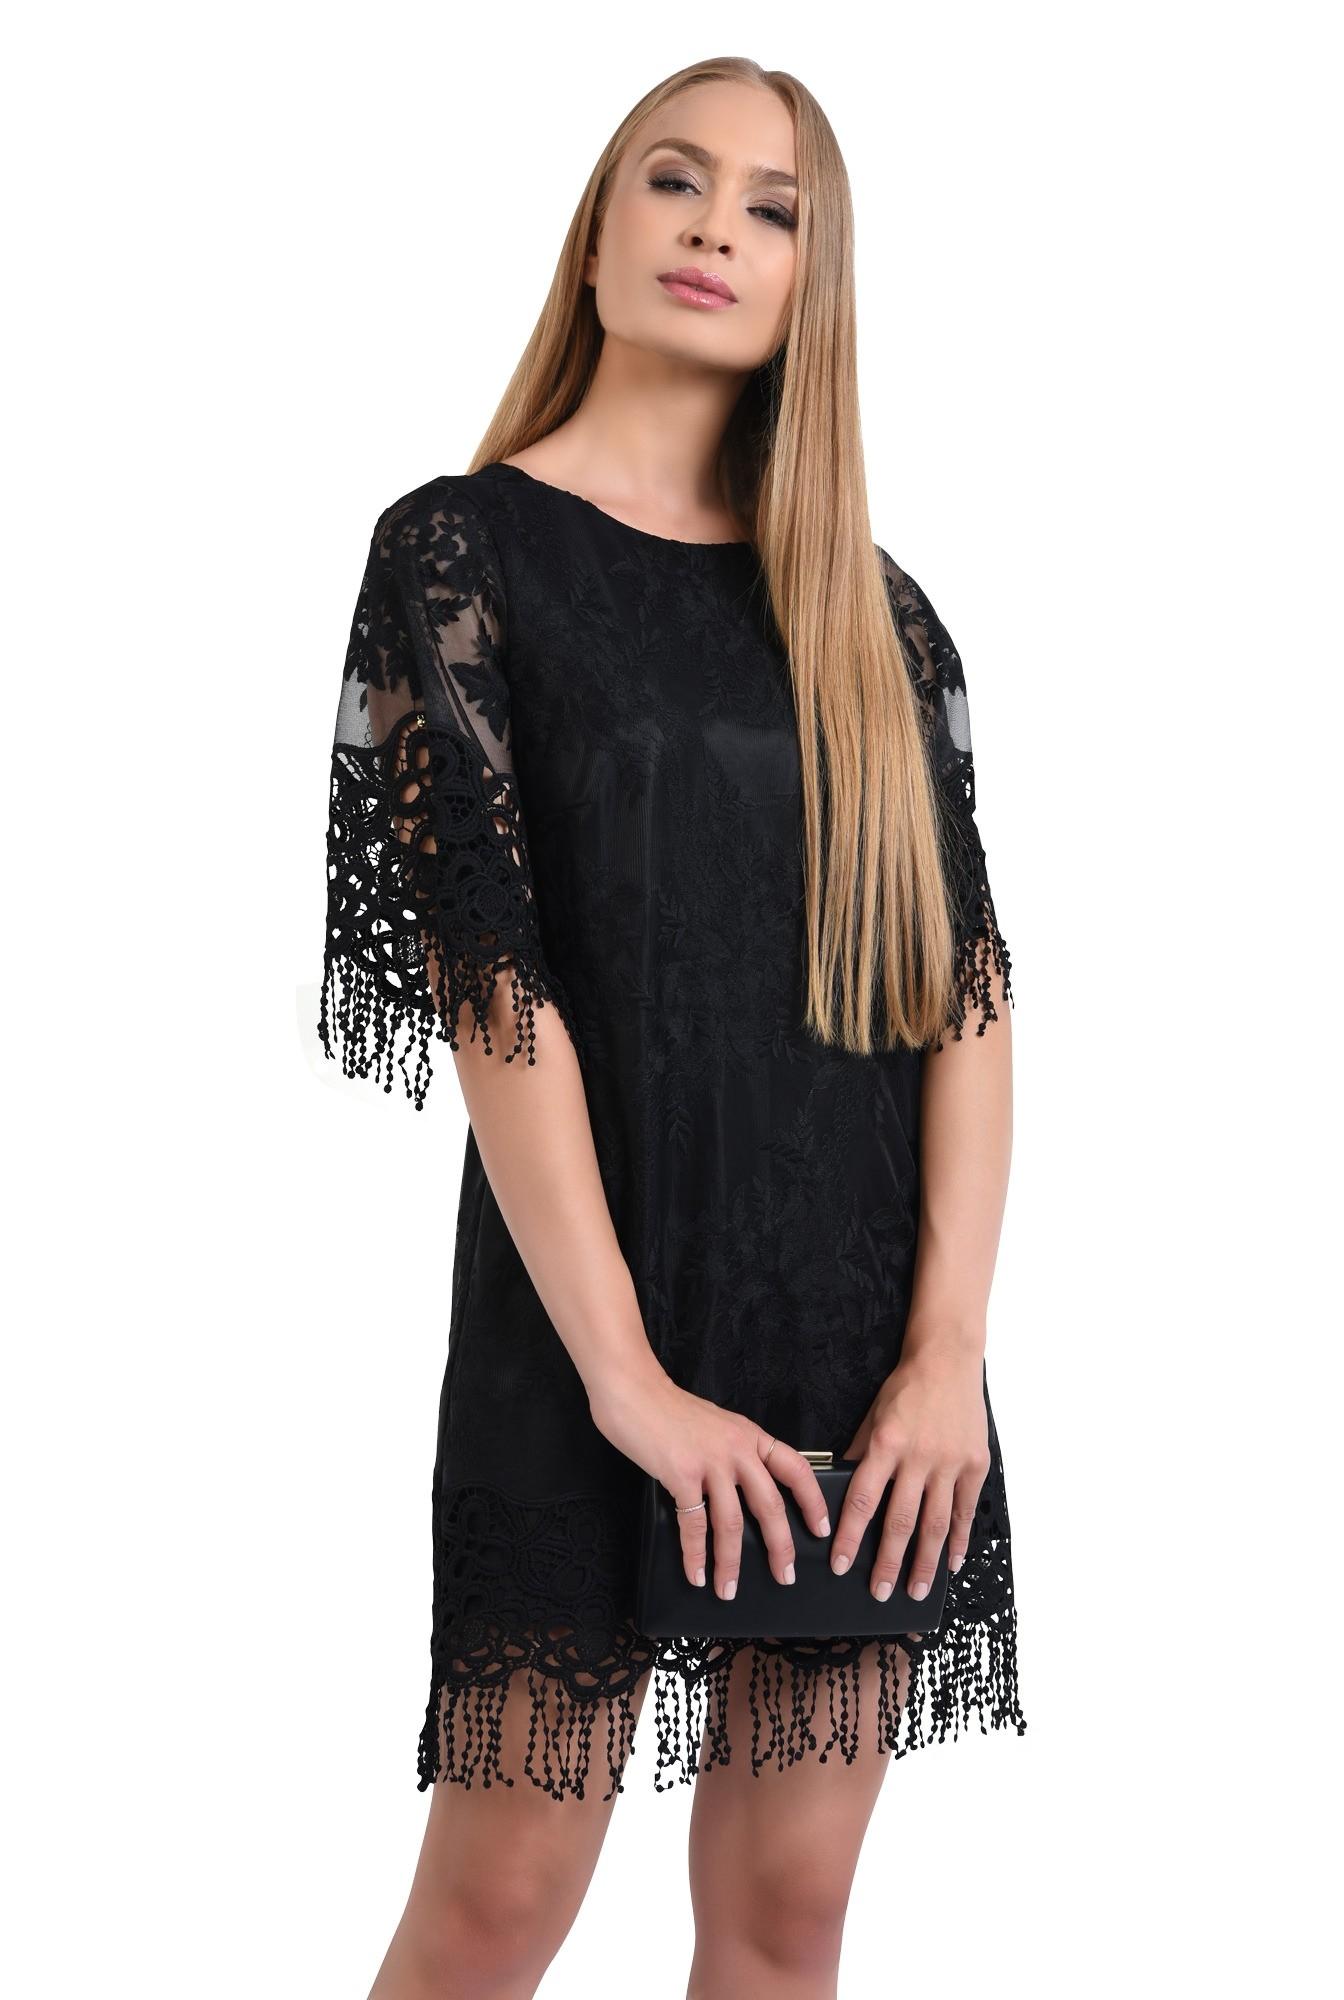 rochie eleganta, dantela brodata, franjuri, rochii online